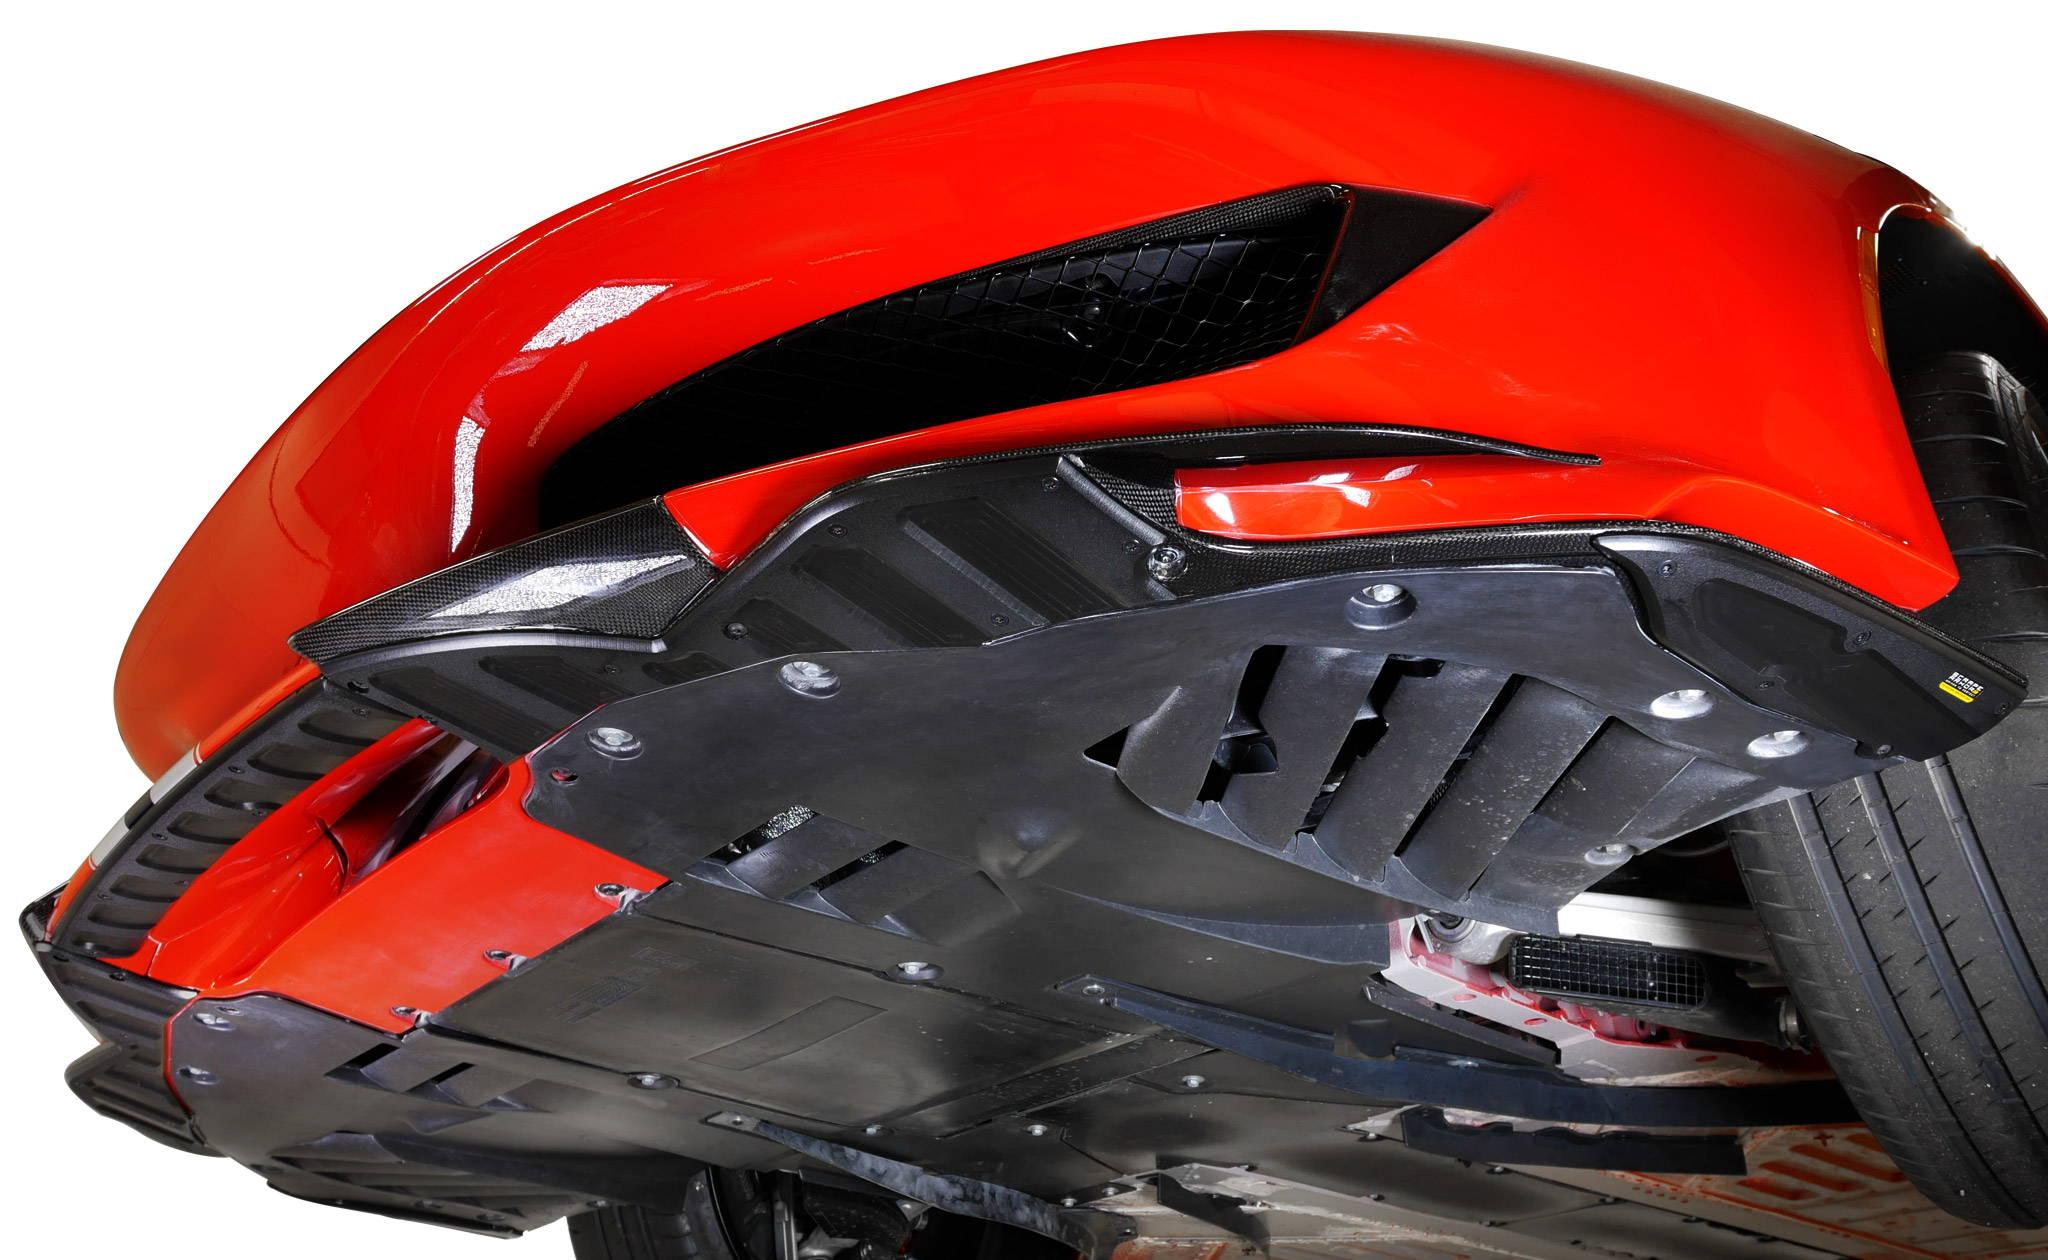 Ferrari 488 Pista Skid Plate Scrape Armor